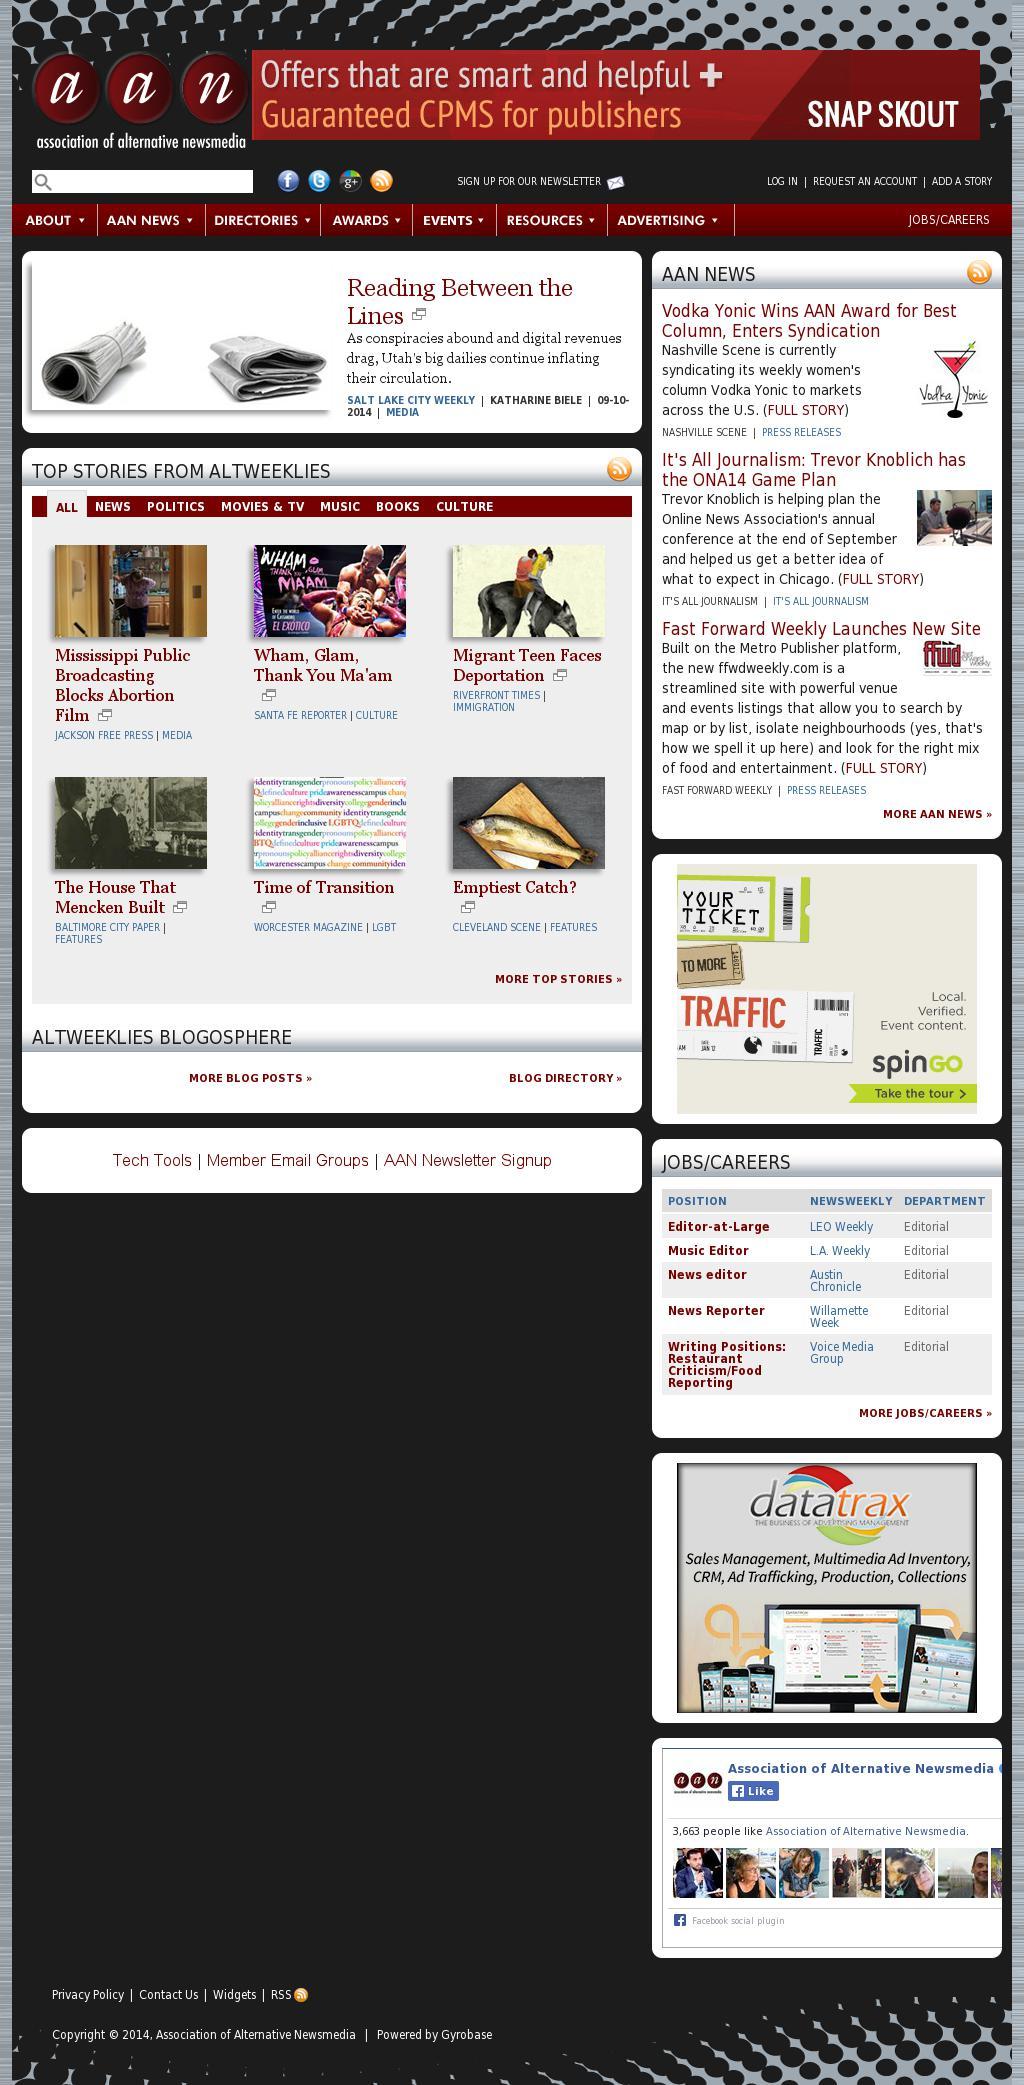 Association of Alternative Newsmedia at Saturday Sept. 13, 2014, 5 a.m. UTC